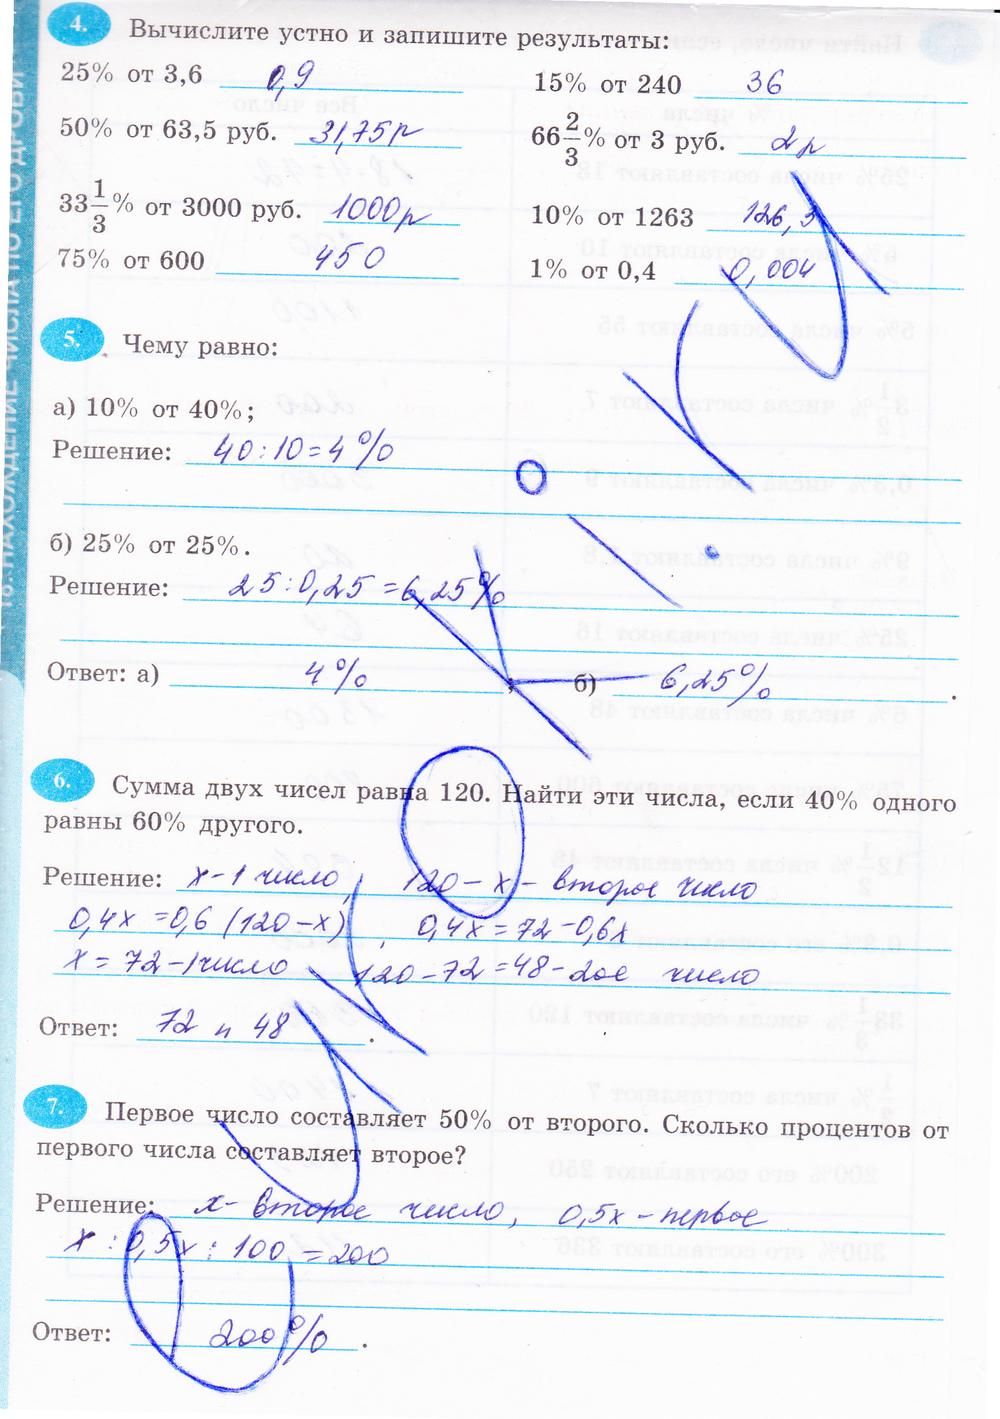 Гдз по математике за 6 класс янченко и кравчук prakard.